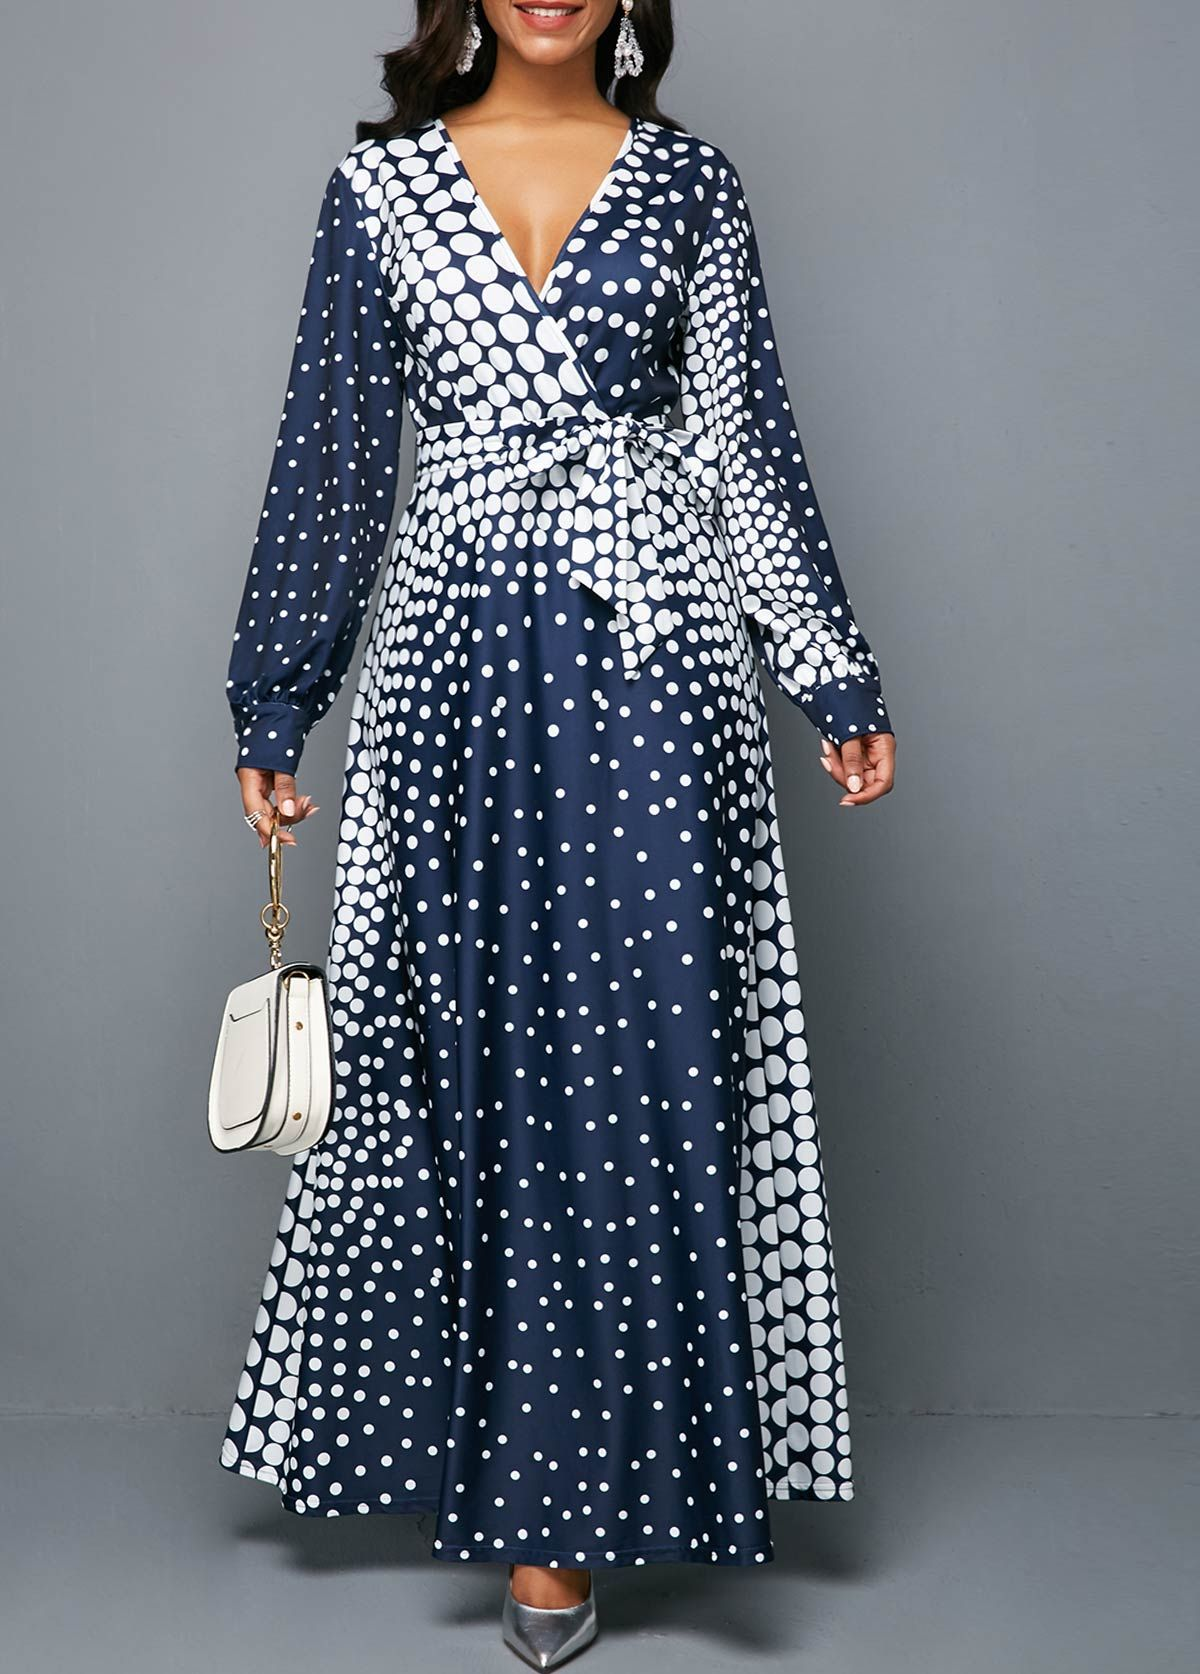 Long Sleeve Polka Dot V Neck Belted Maxi Dress Fashion Dresses Online African Dresses Modern Long Sleeve Black Maxi Dress [ 1674 x 1200 Pixel ]